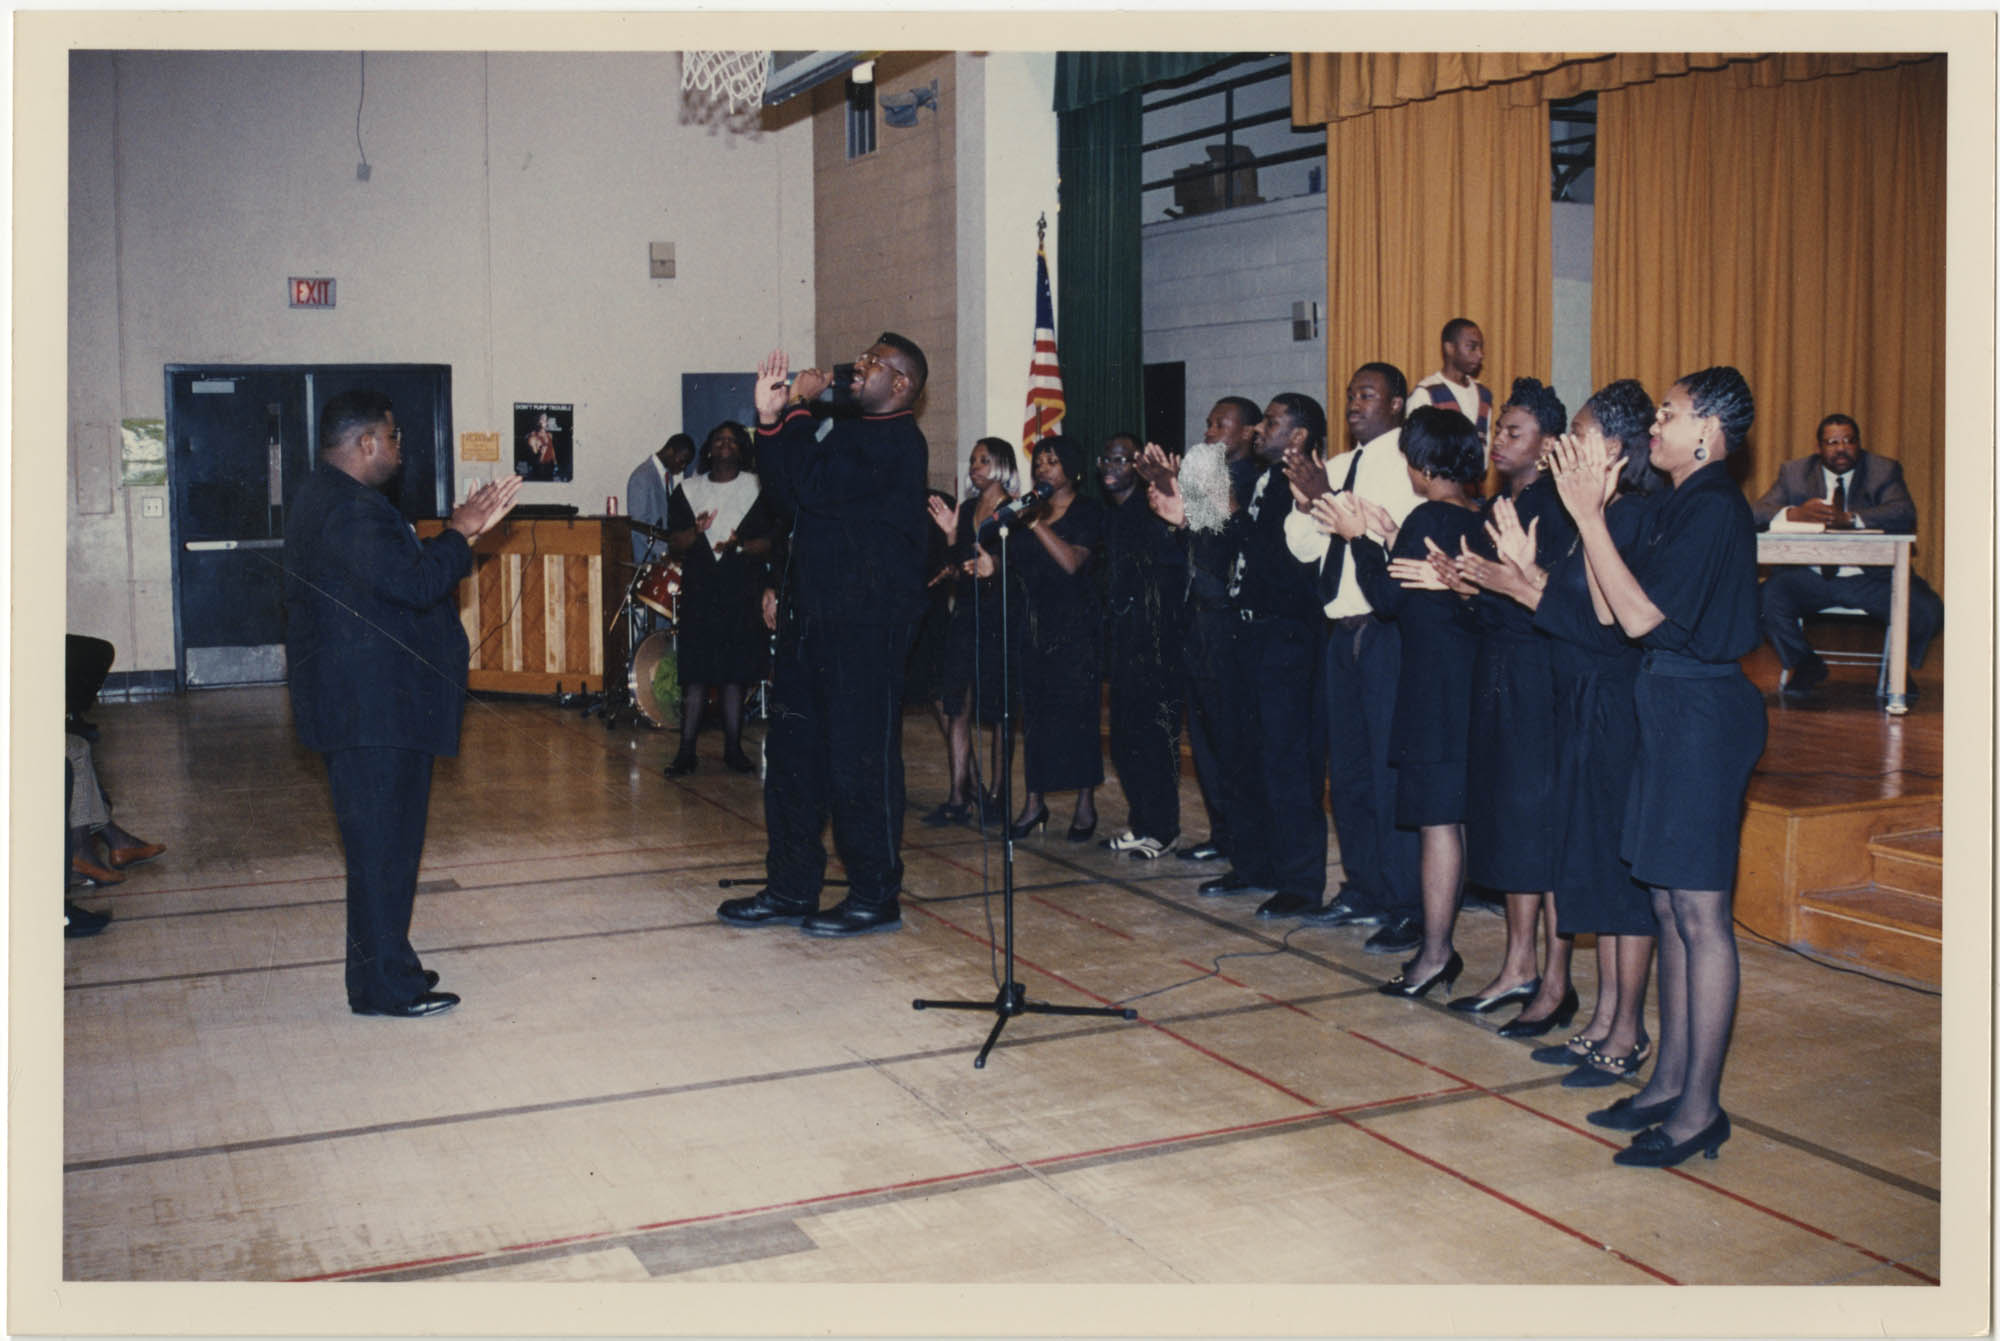 Photograph of a Choir